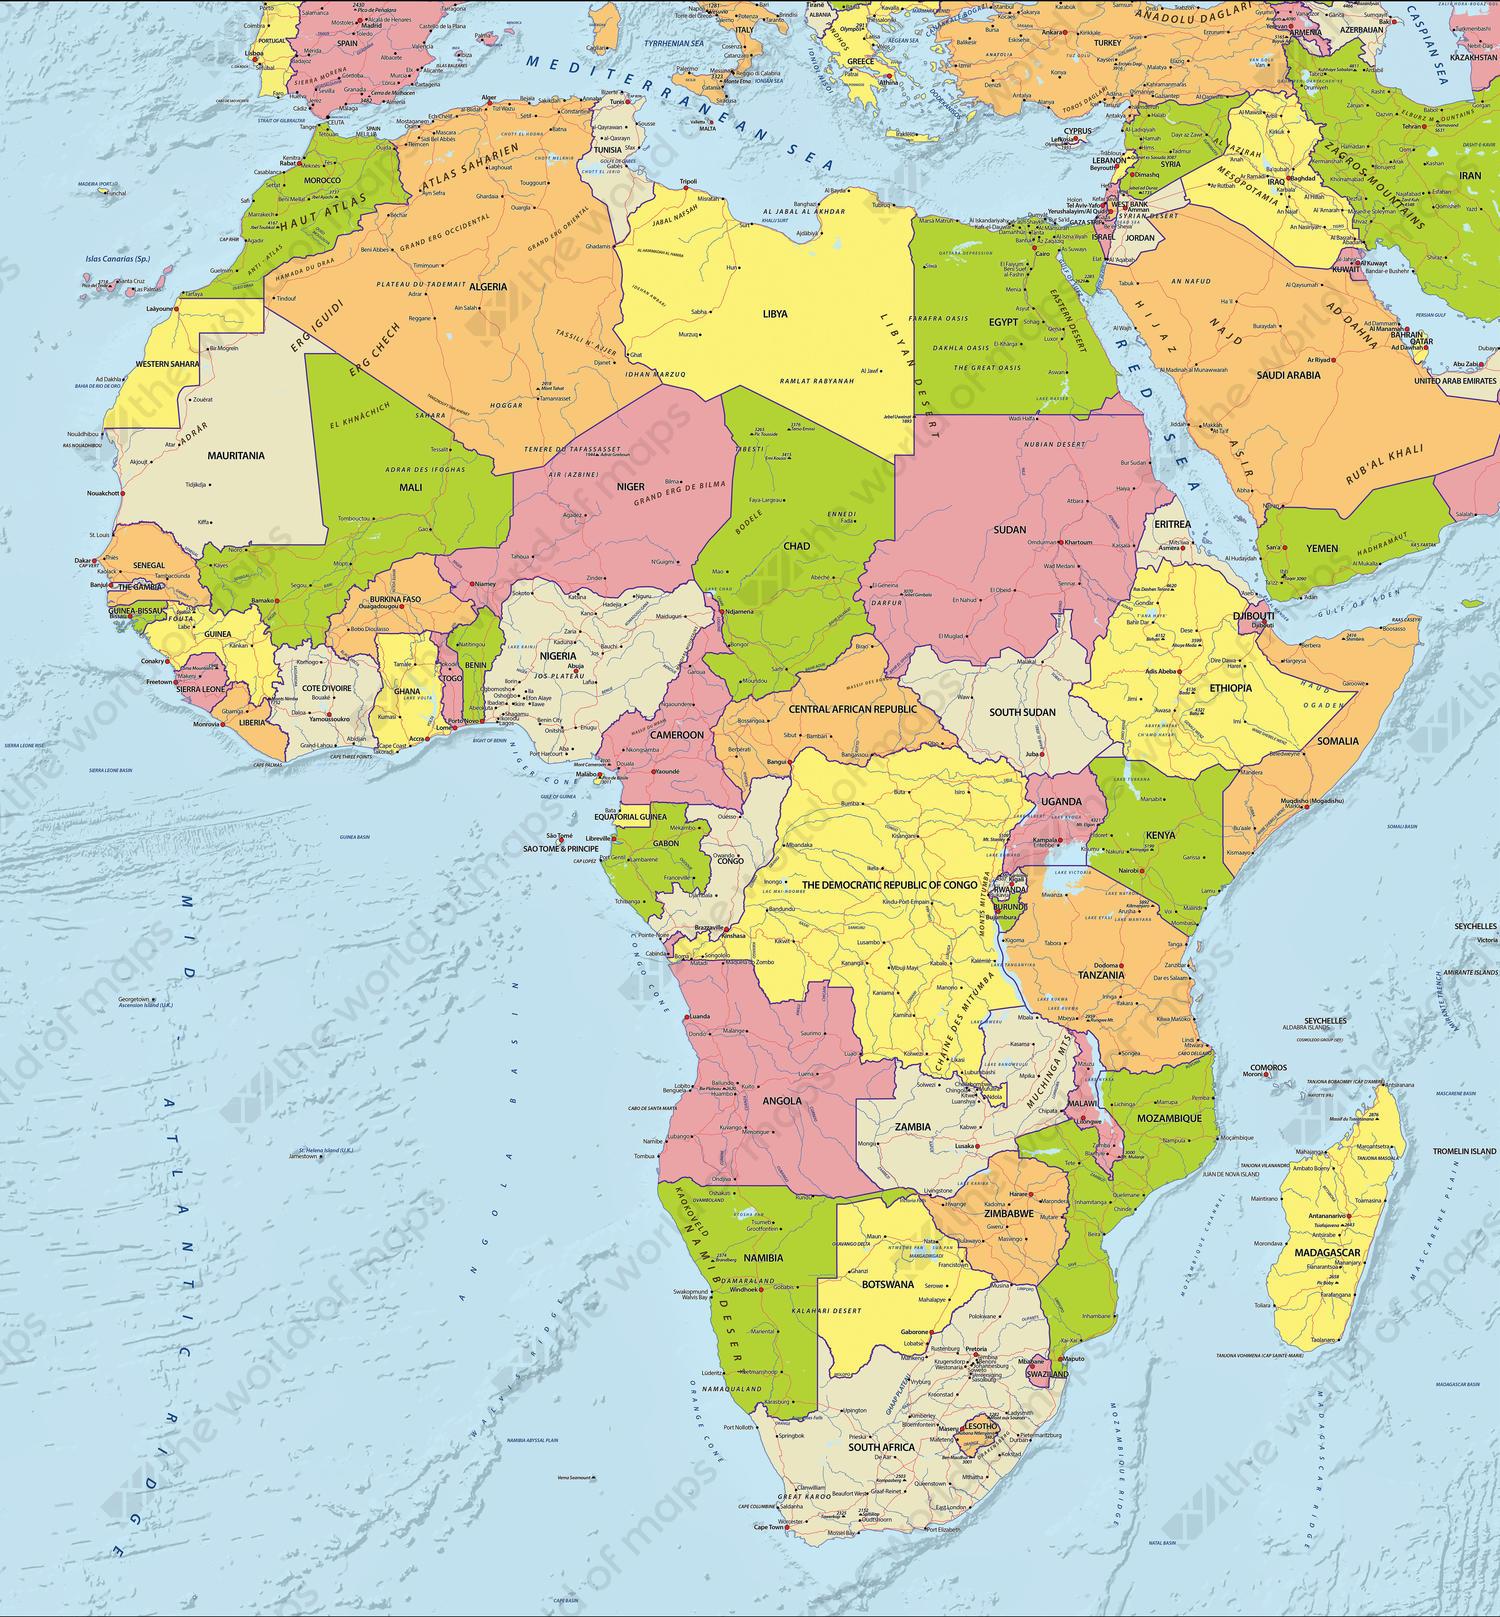 Digital Political Map Africa 627 The World of Mapscom